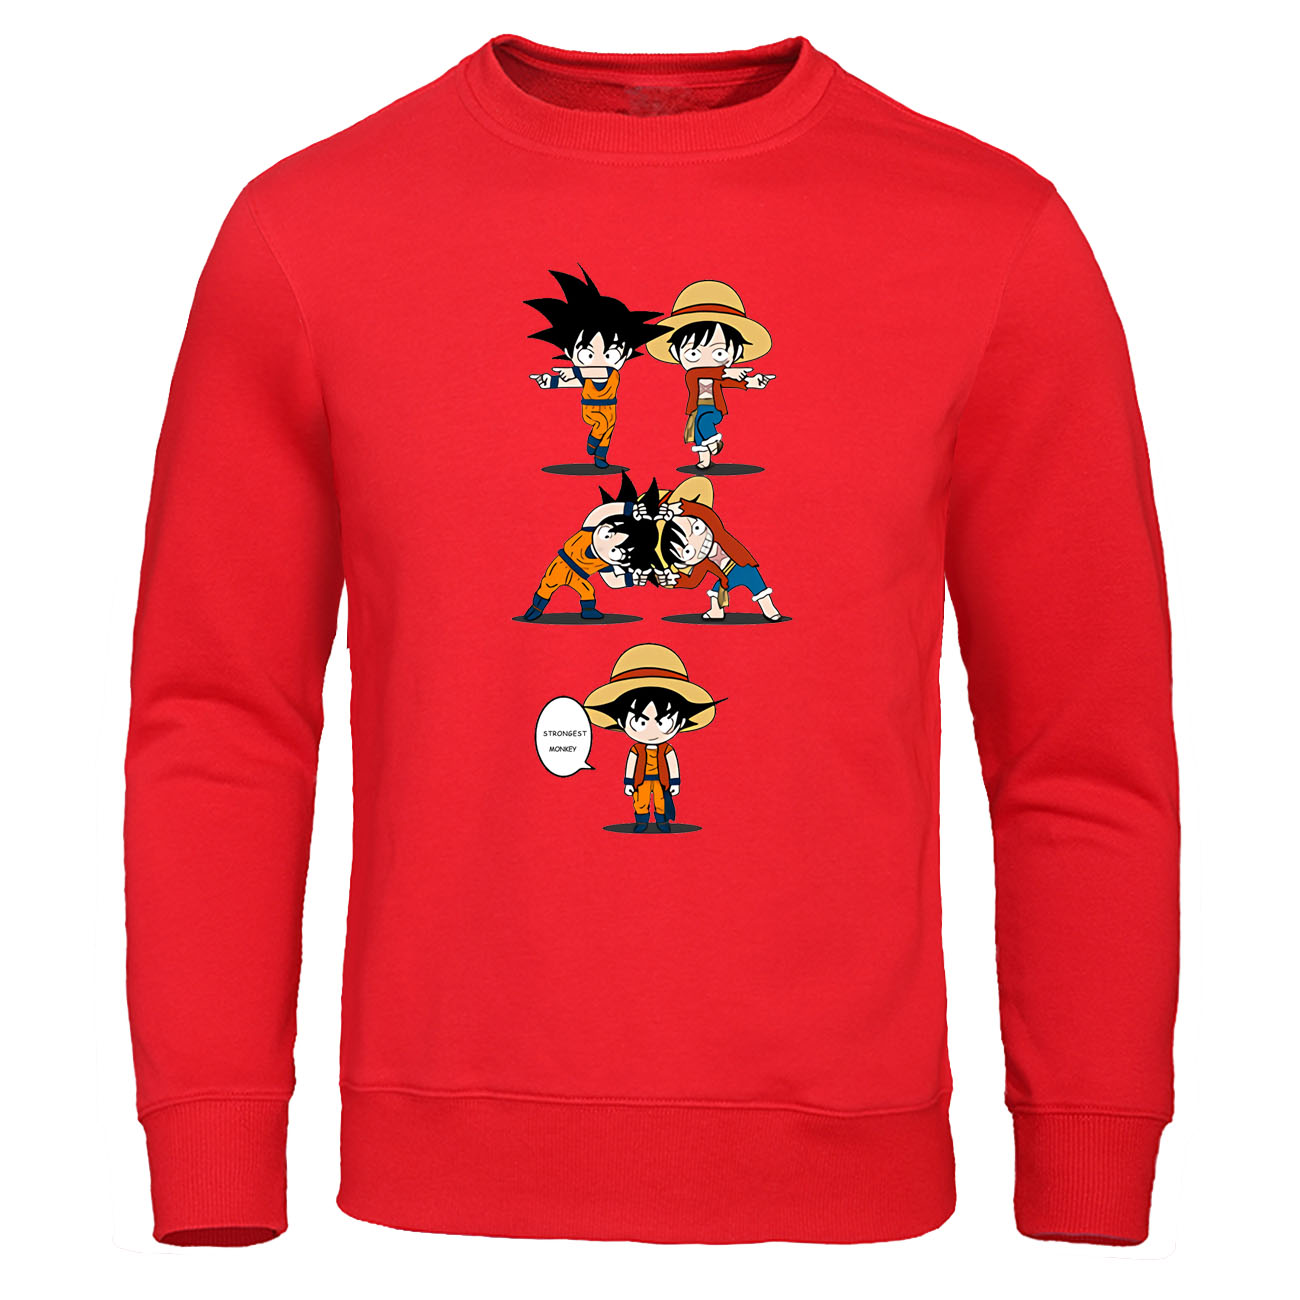 Goku VS Luffy Hoodies Cool Design Pullover Dragon Ball Crossover One Piece Black Sweatshirt Japanese Anime Streetwear Men Hoody